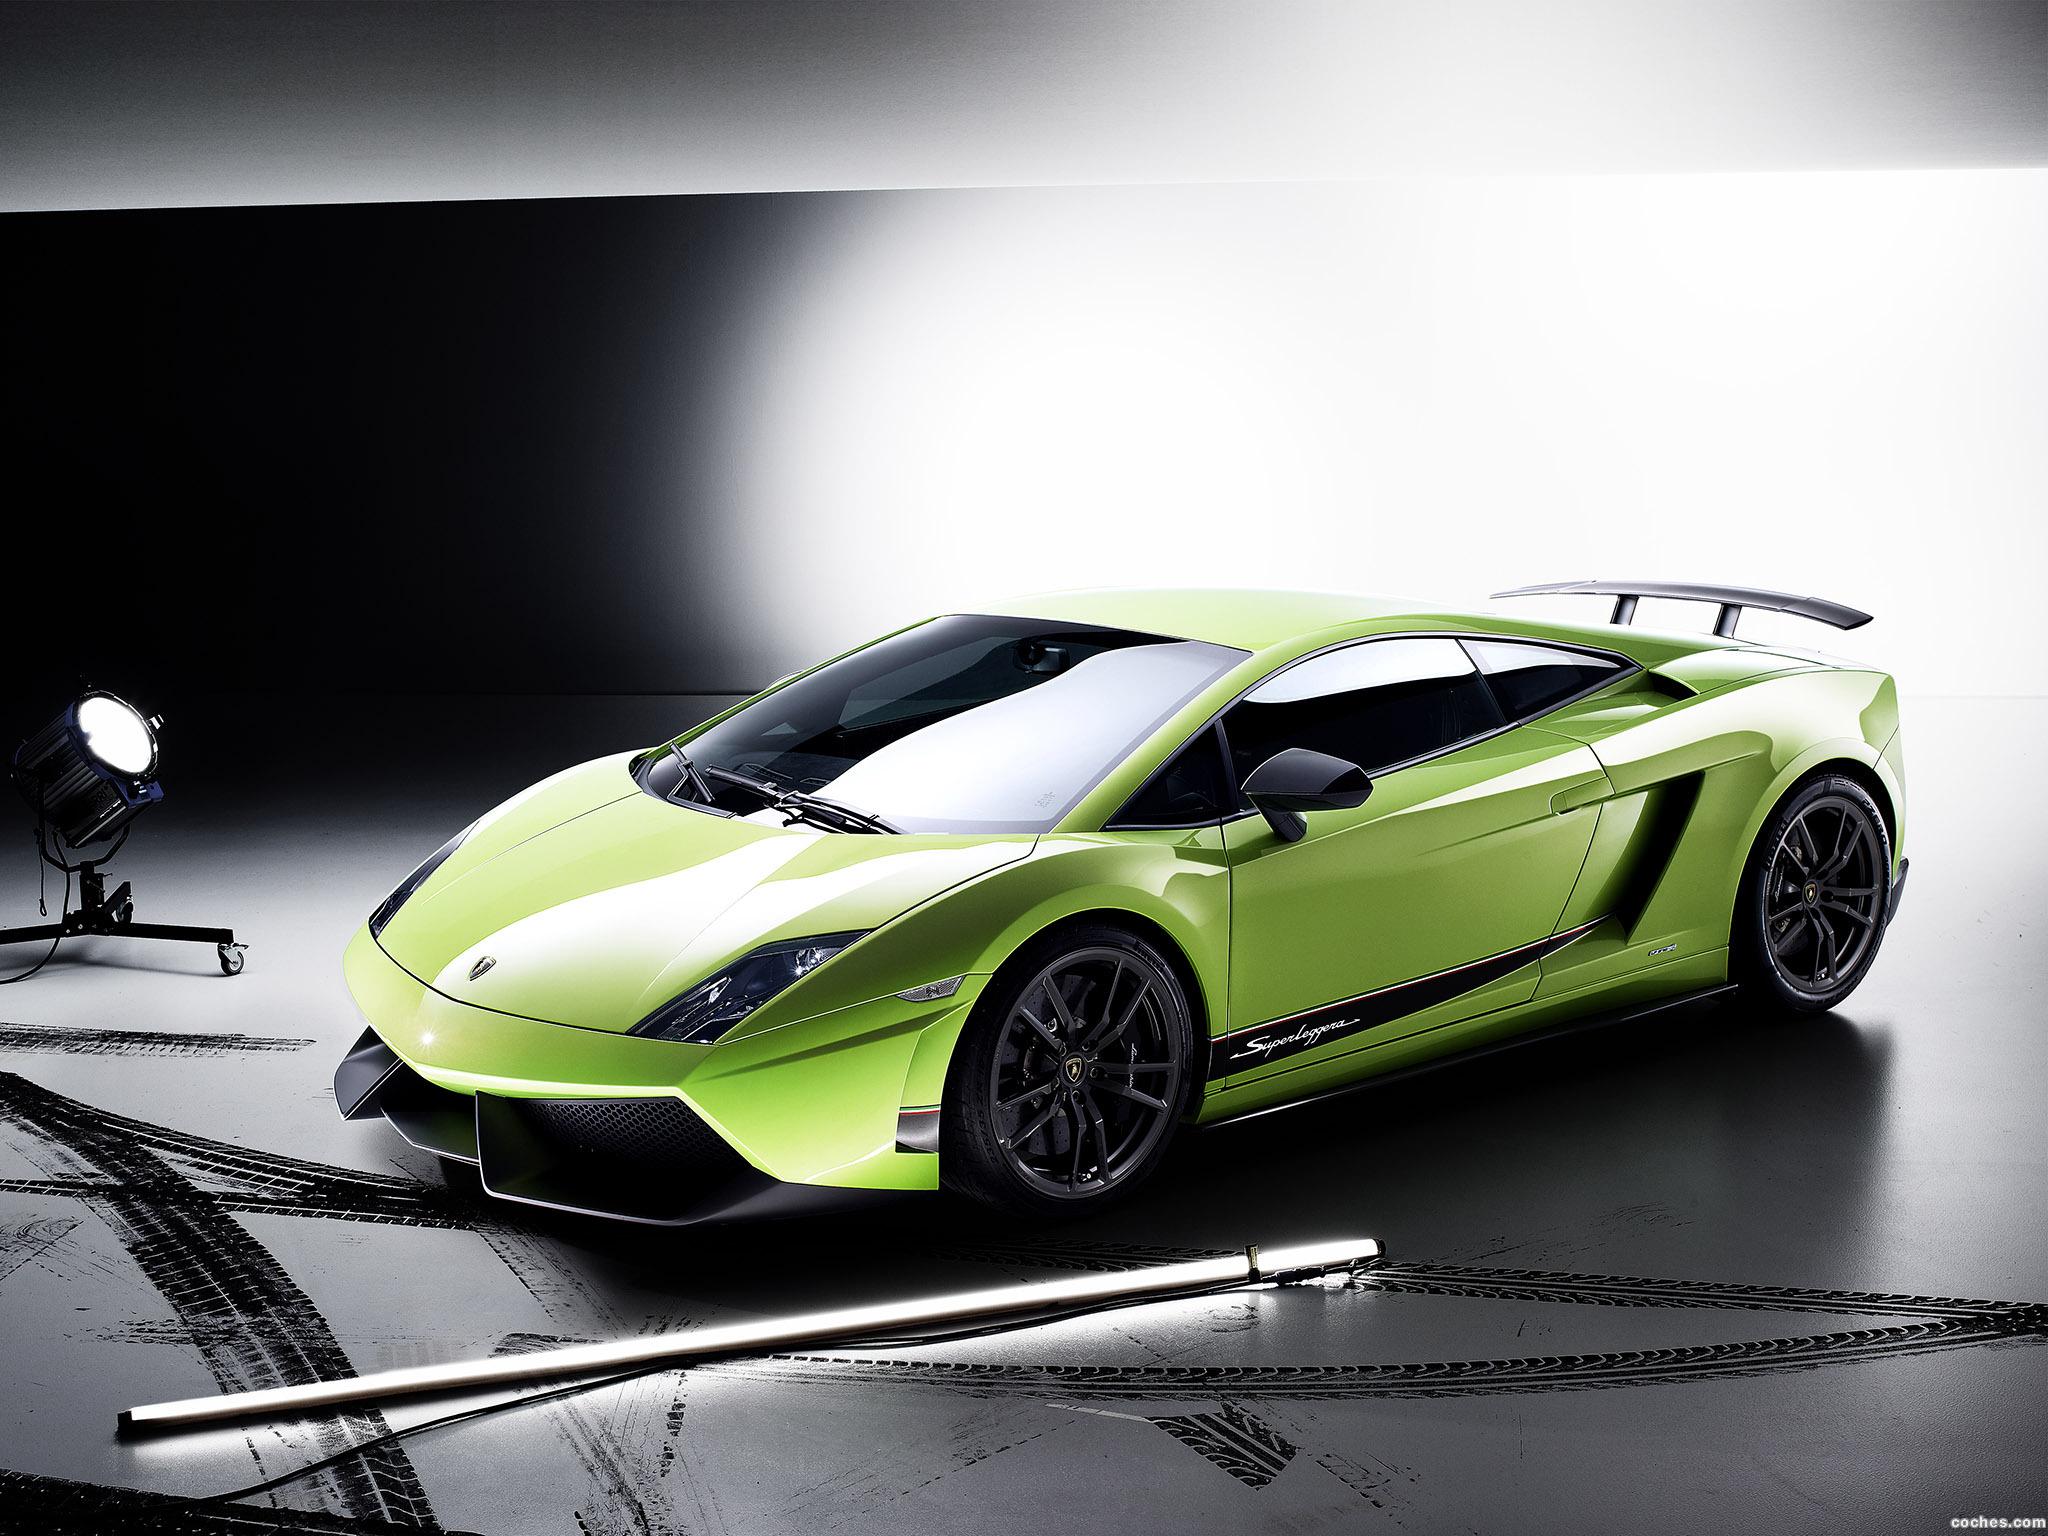 Foto 0 de Lamborghini Gallardo LP570-4 Superleggera 2010